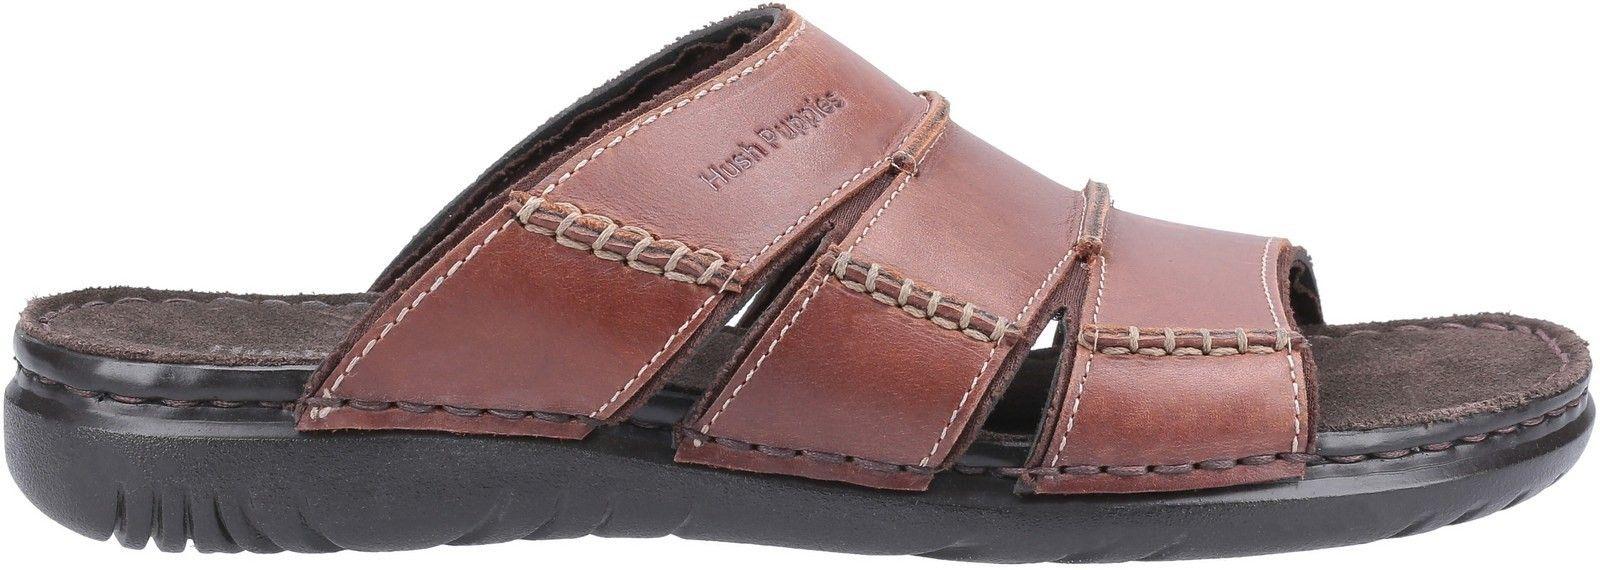 Cameron Mule Sandal